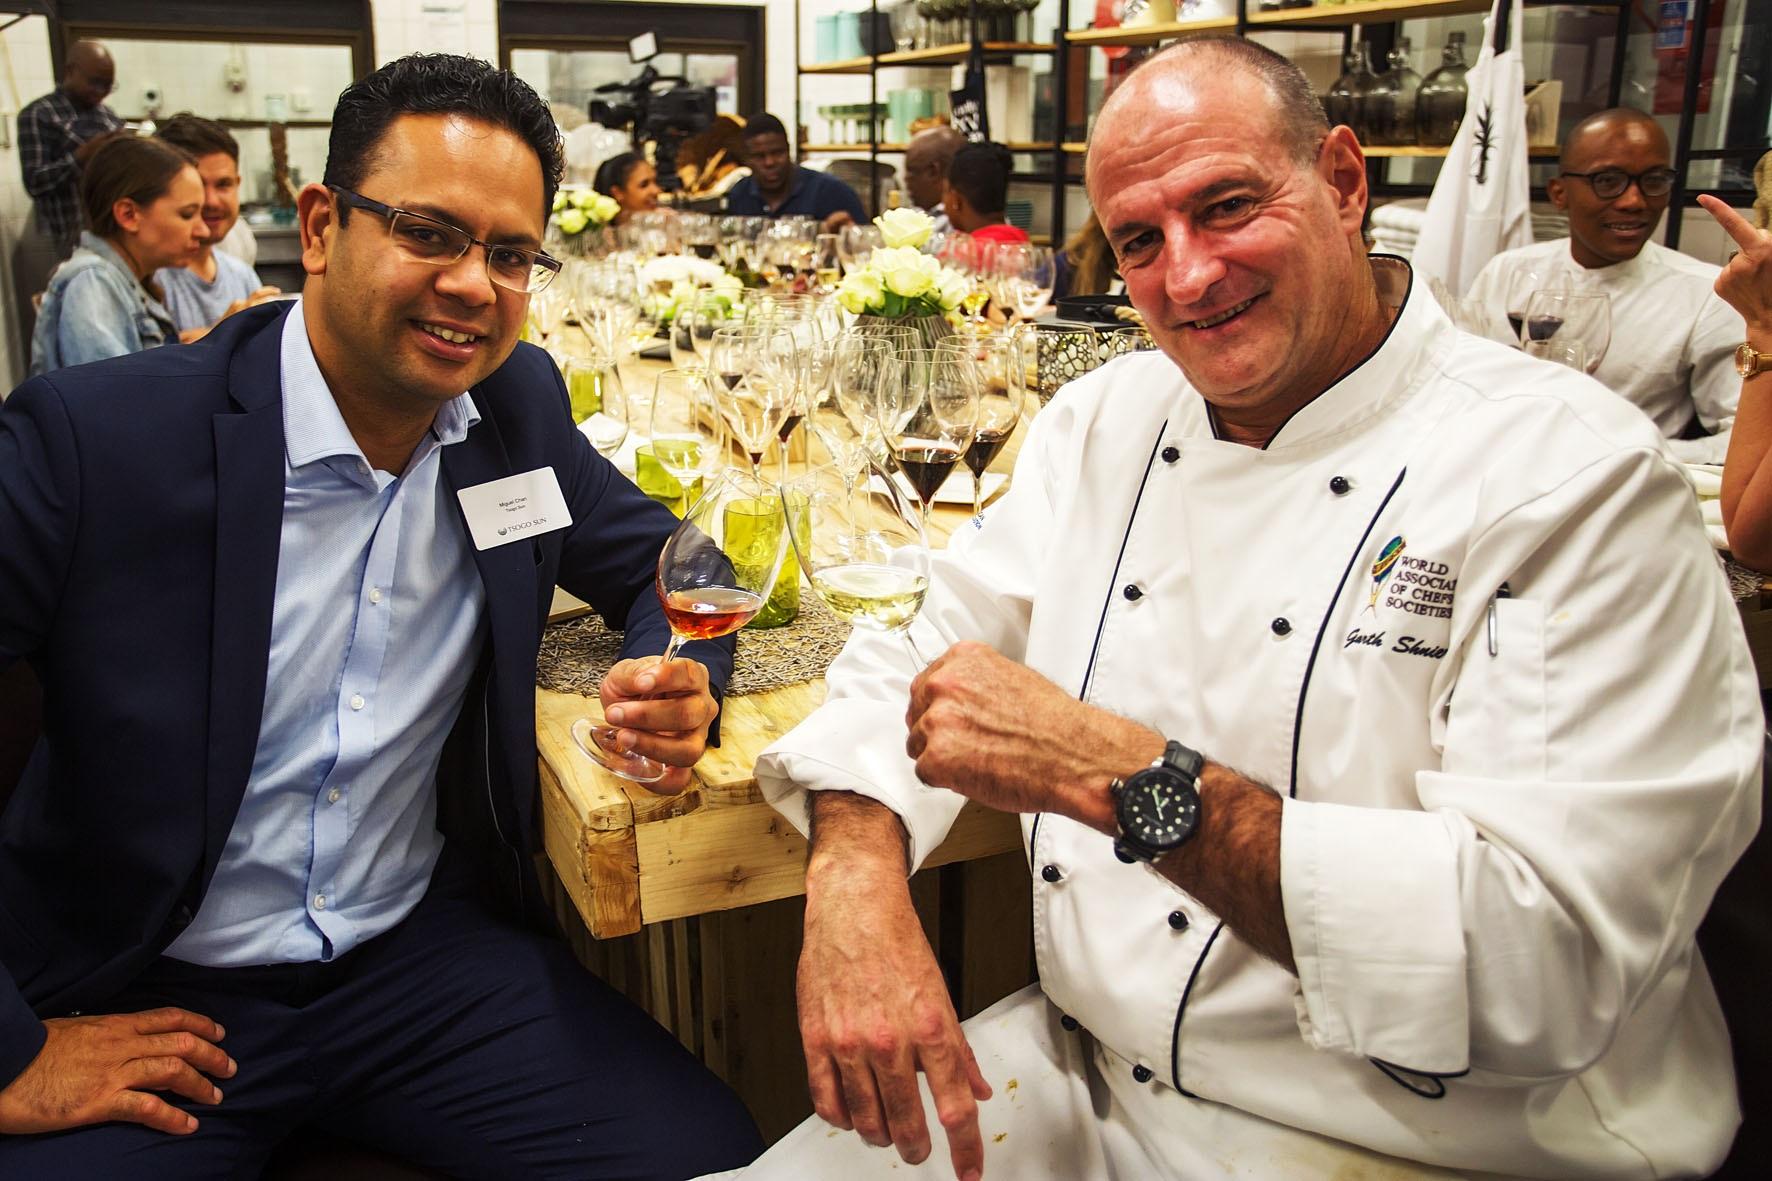 Tsogo Sun shows off wine auction haul in intimate wine tasting photo